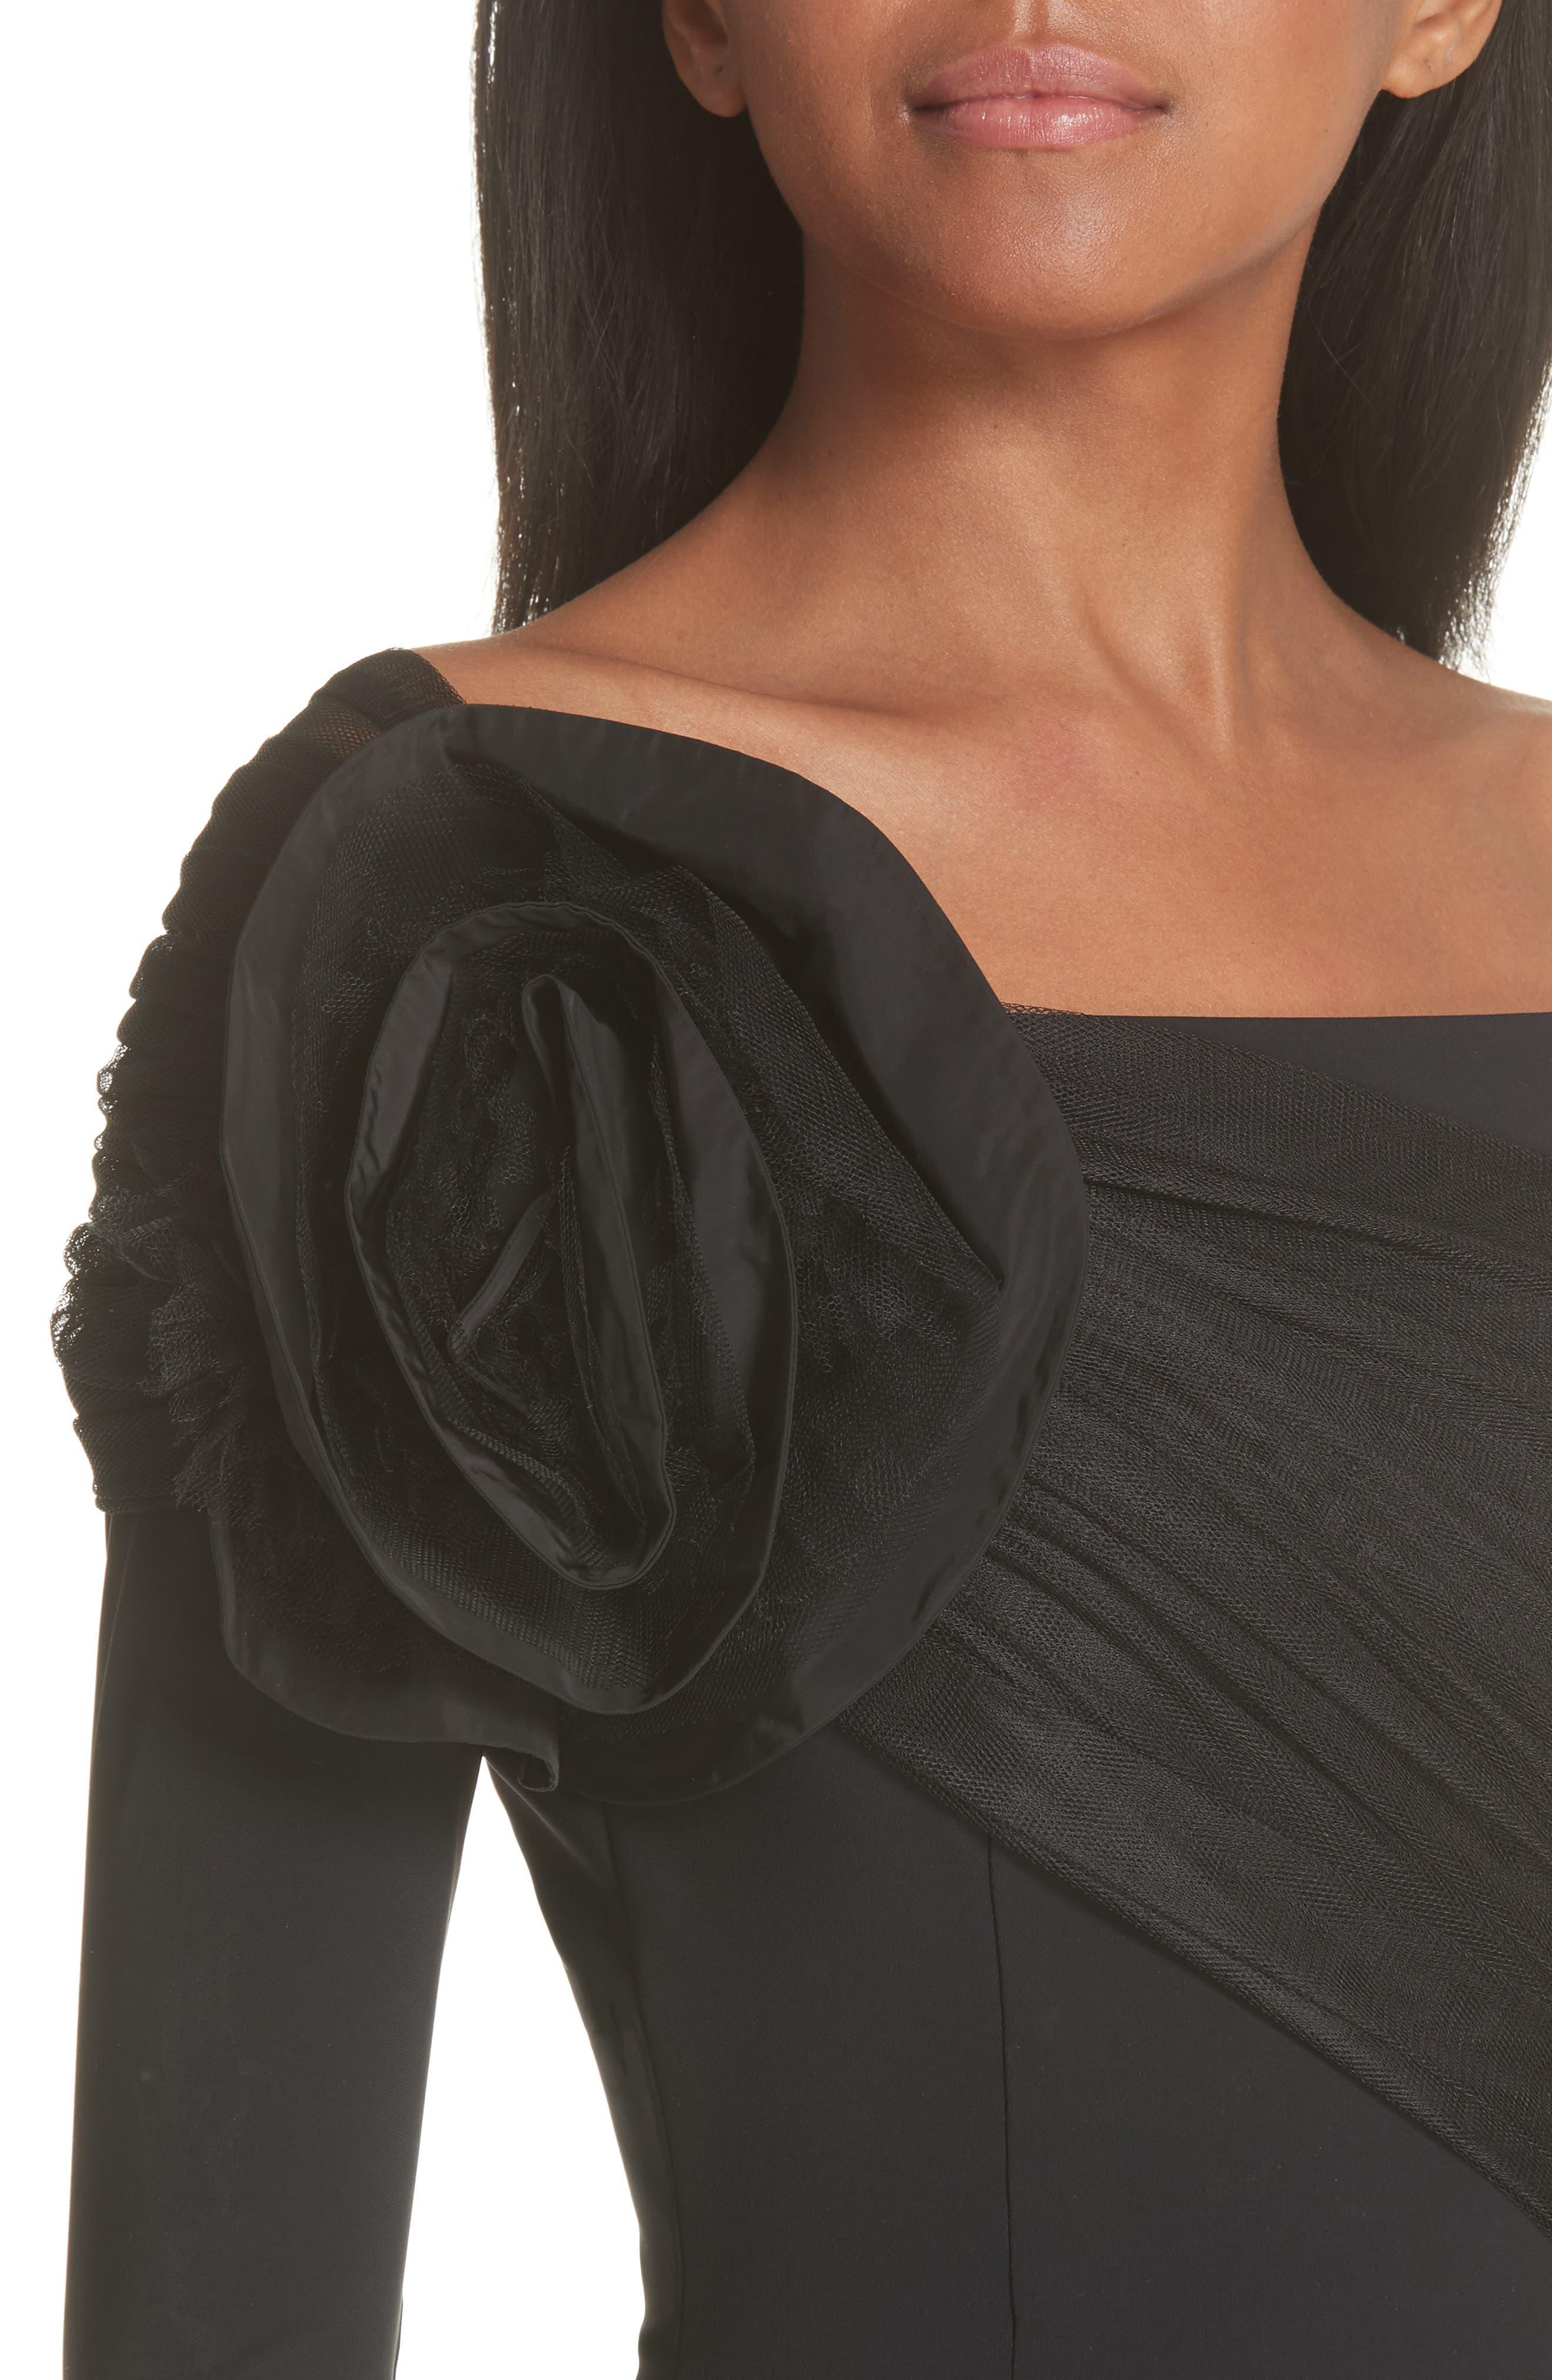 Altyn Taffeta Rose Cocktail Dress,                             Alternate thumbnail 4, color,                             BLACK